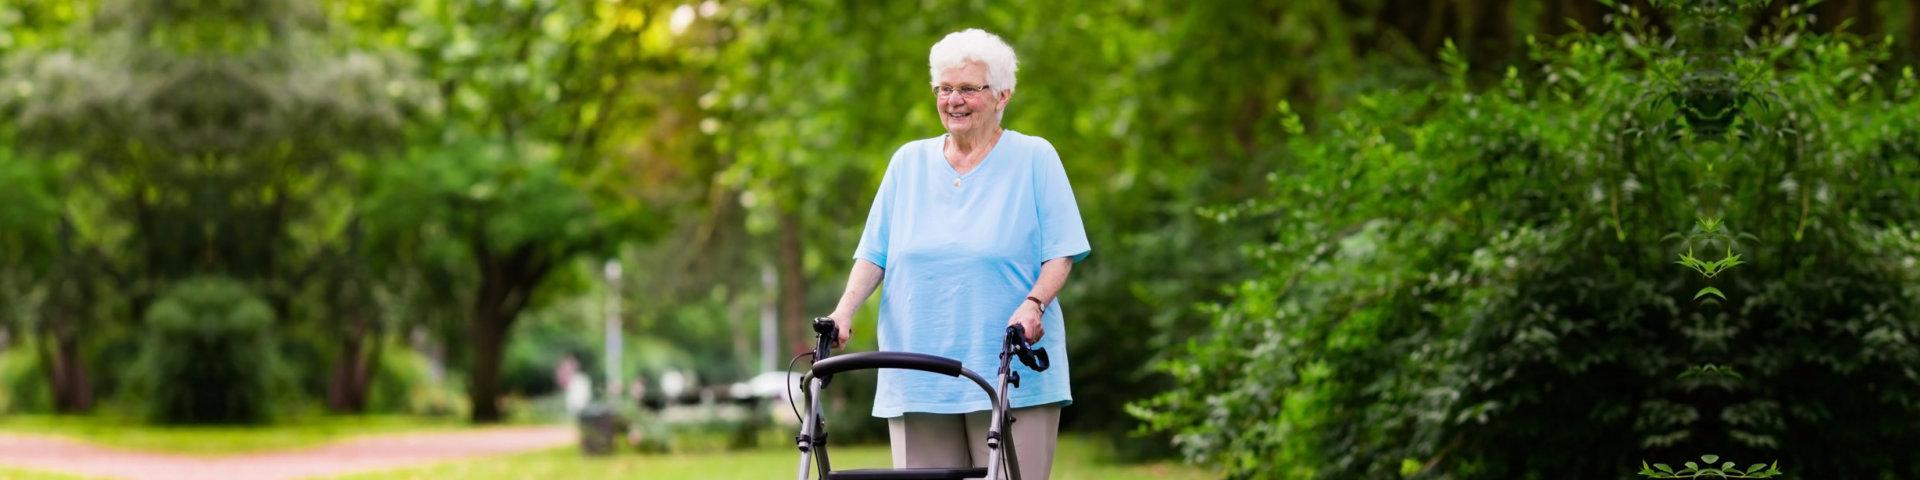 senior handicapped lady with a walking disability enjoying a walk